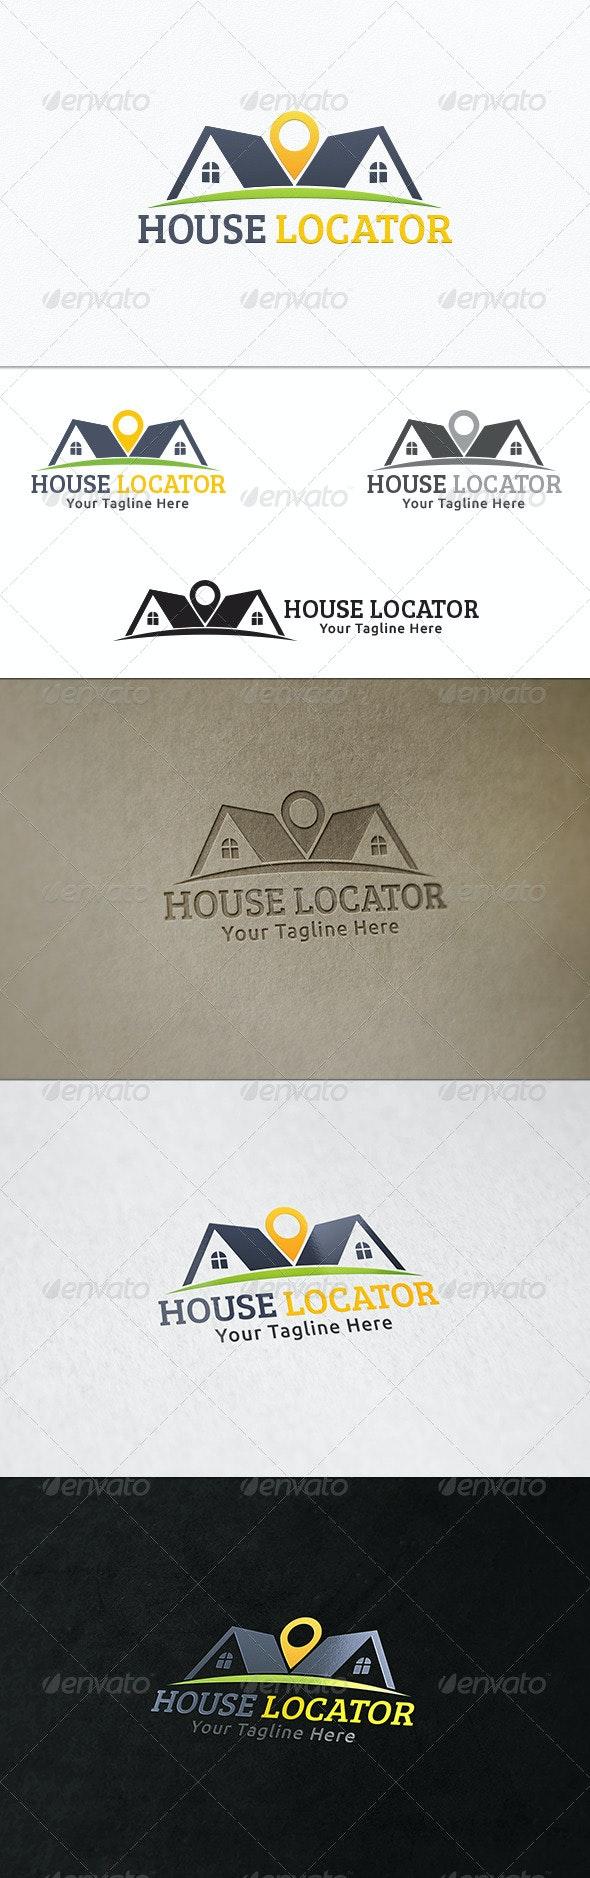 House Locator - Logo Template - Buildings Logo Templates